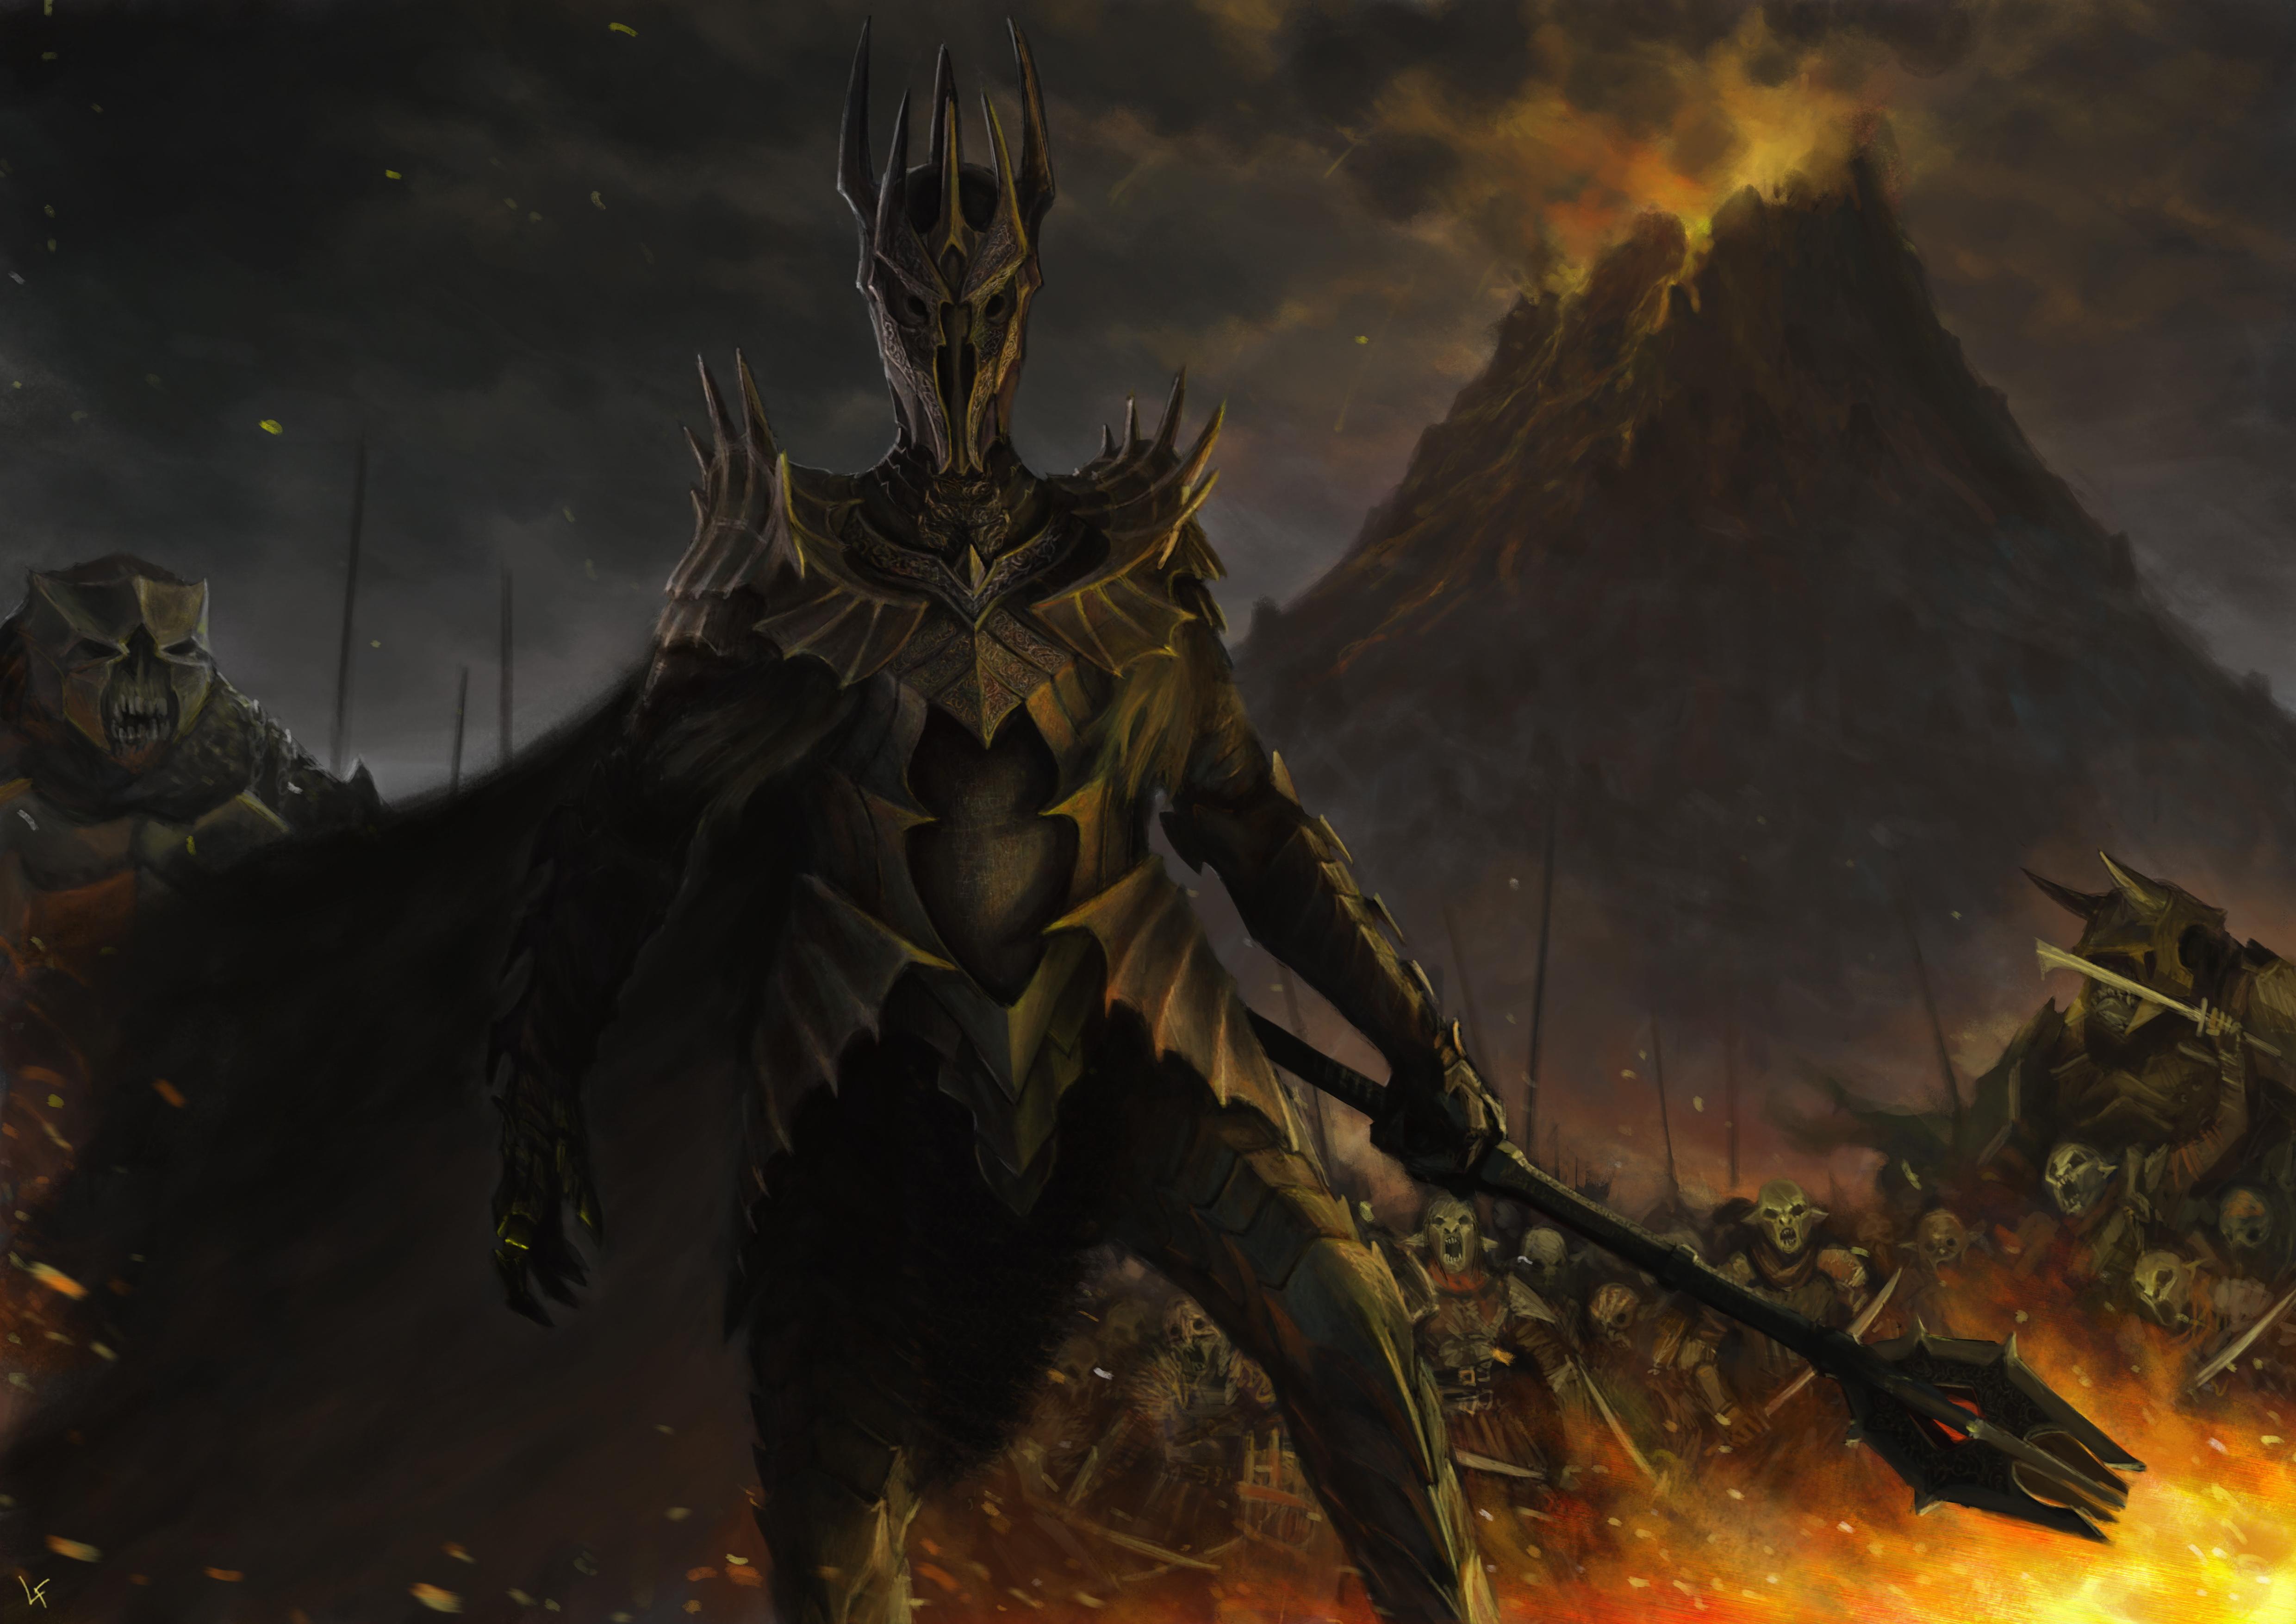 Fingolfin runs the Maiar (and 1 Dragon) gauntlet ...